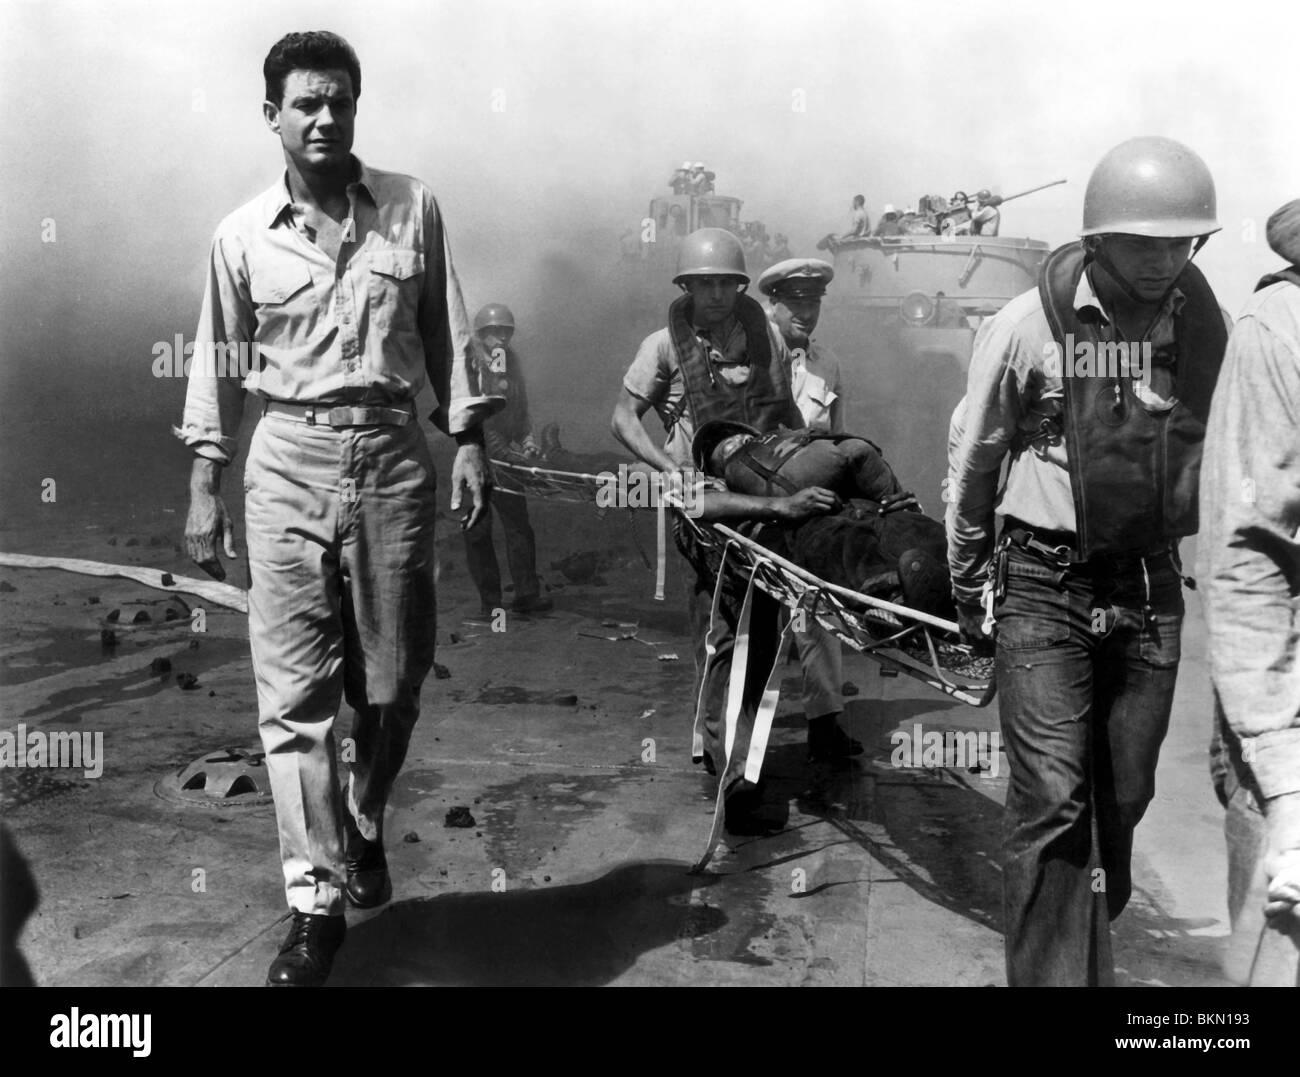 PT 109 -1963 CLIFF ROBERTSON - Stock Image